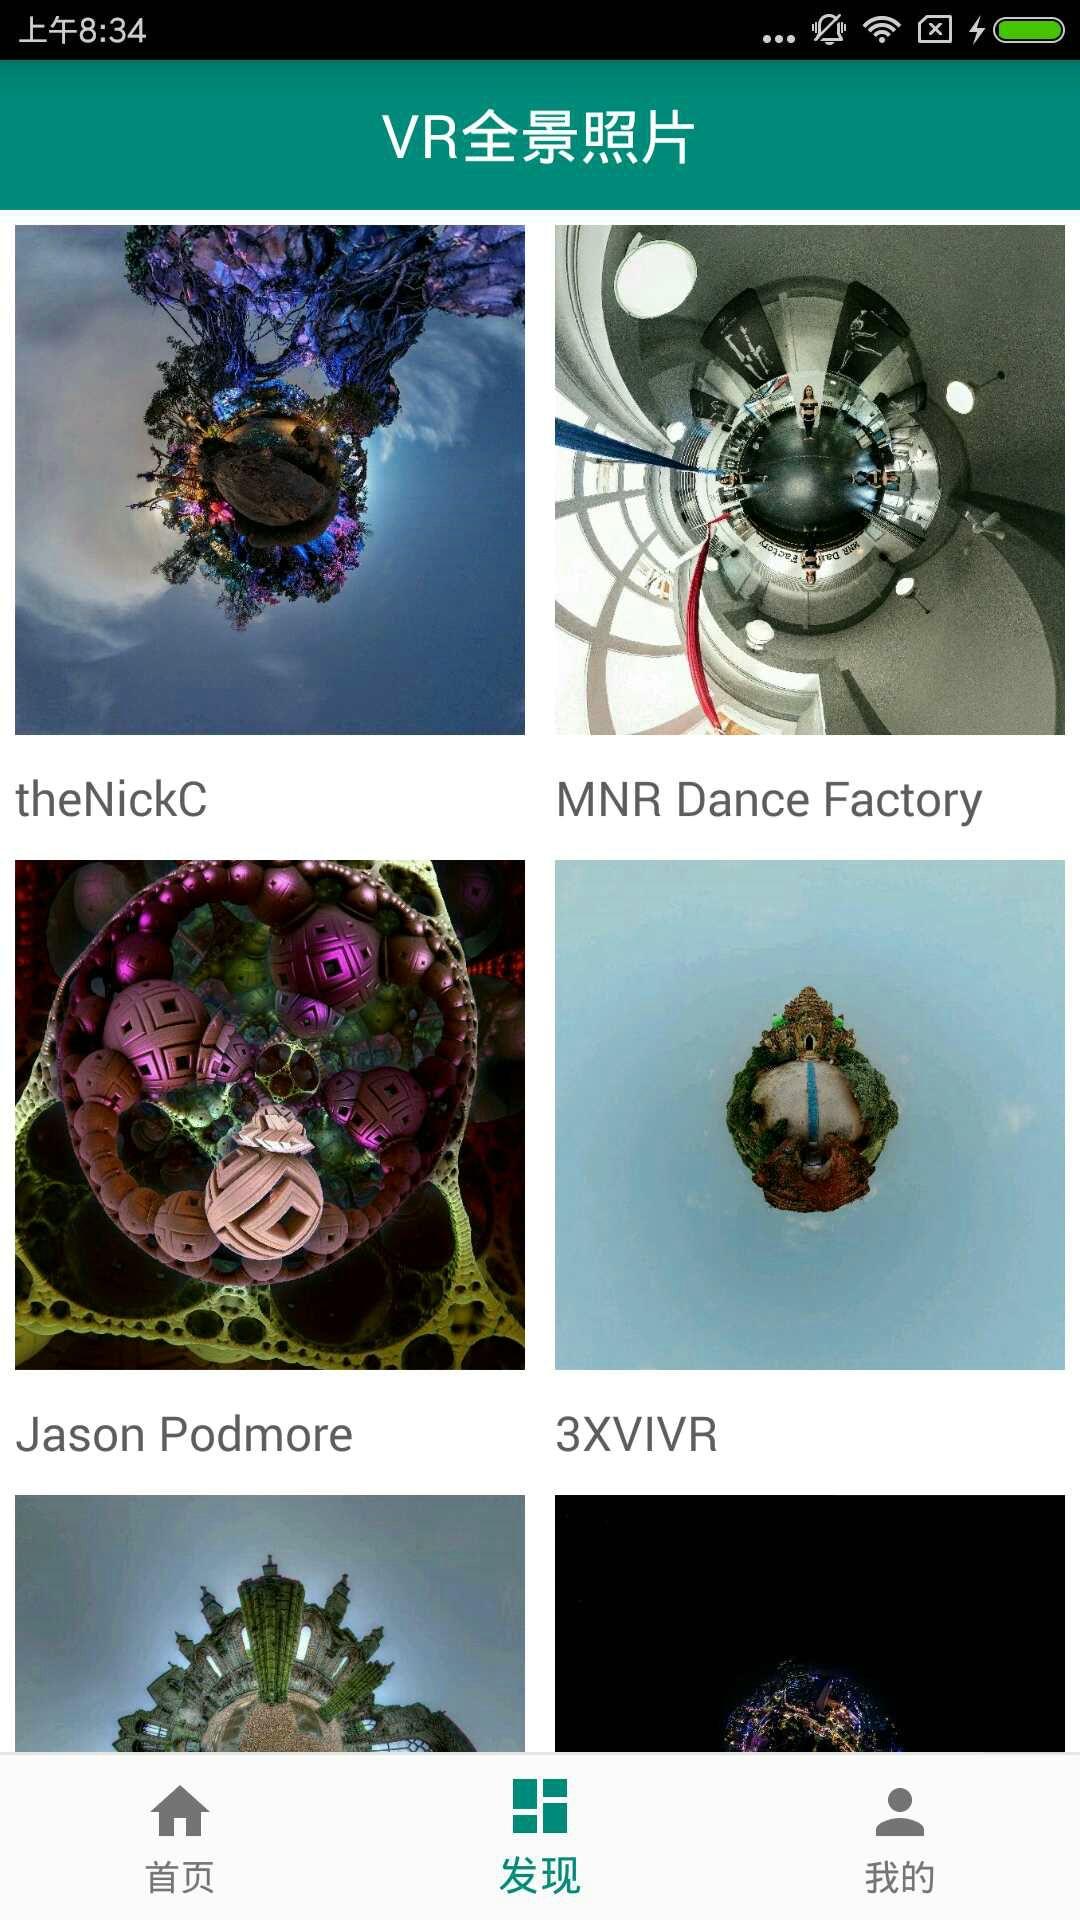 VR全景照片 APP截图